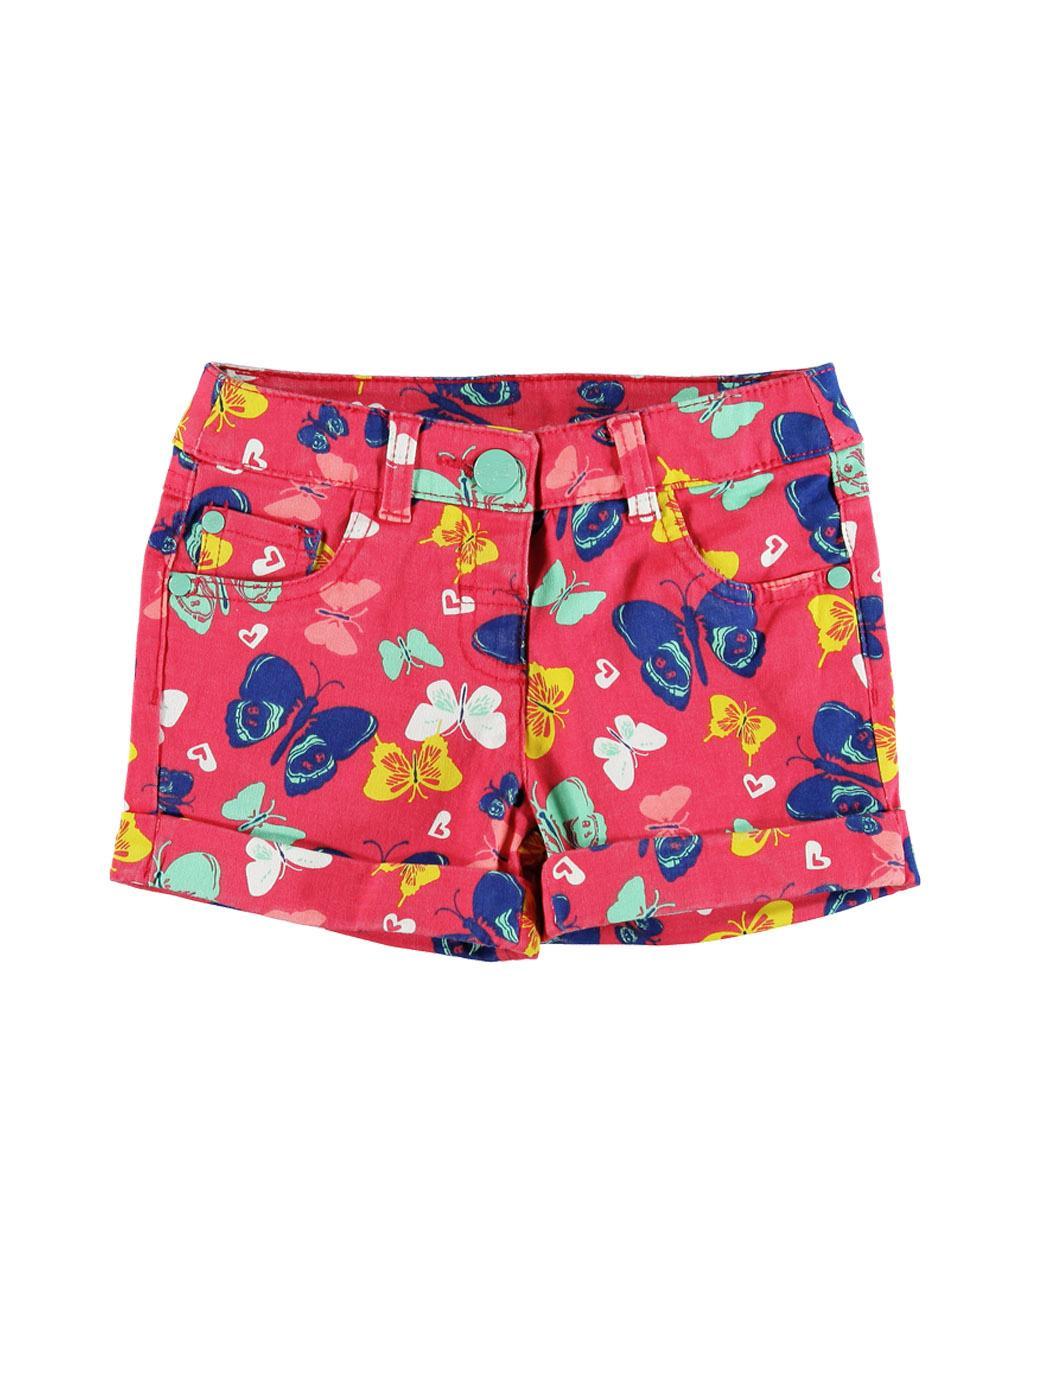 Waikiki Детская Одежда